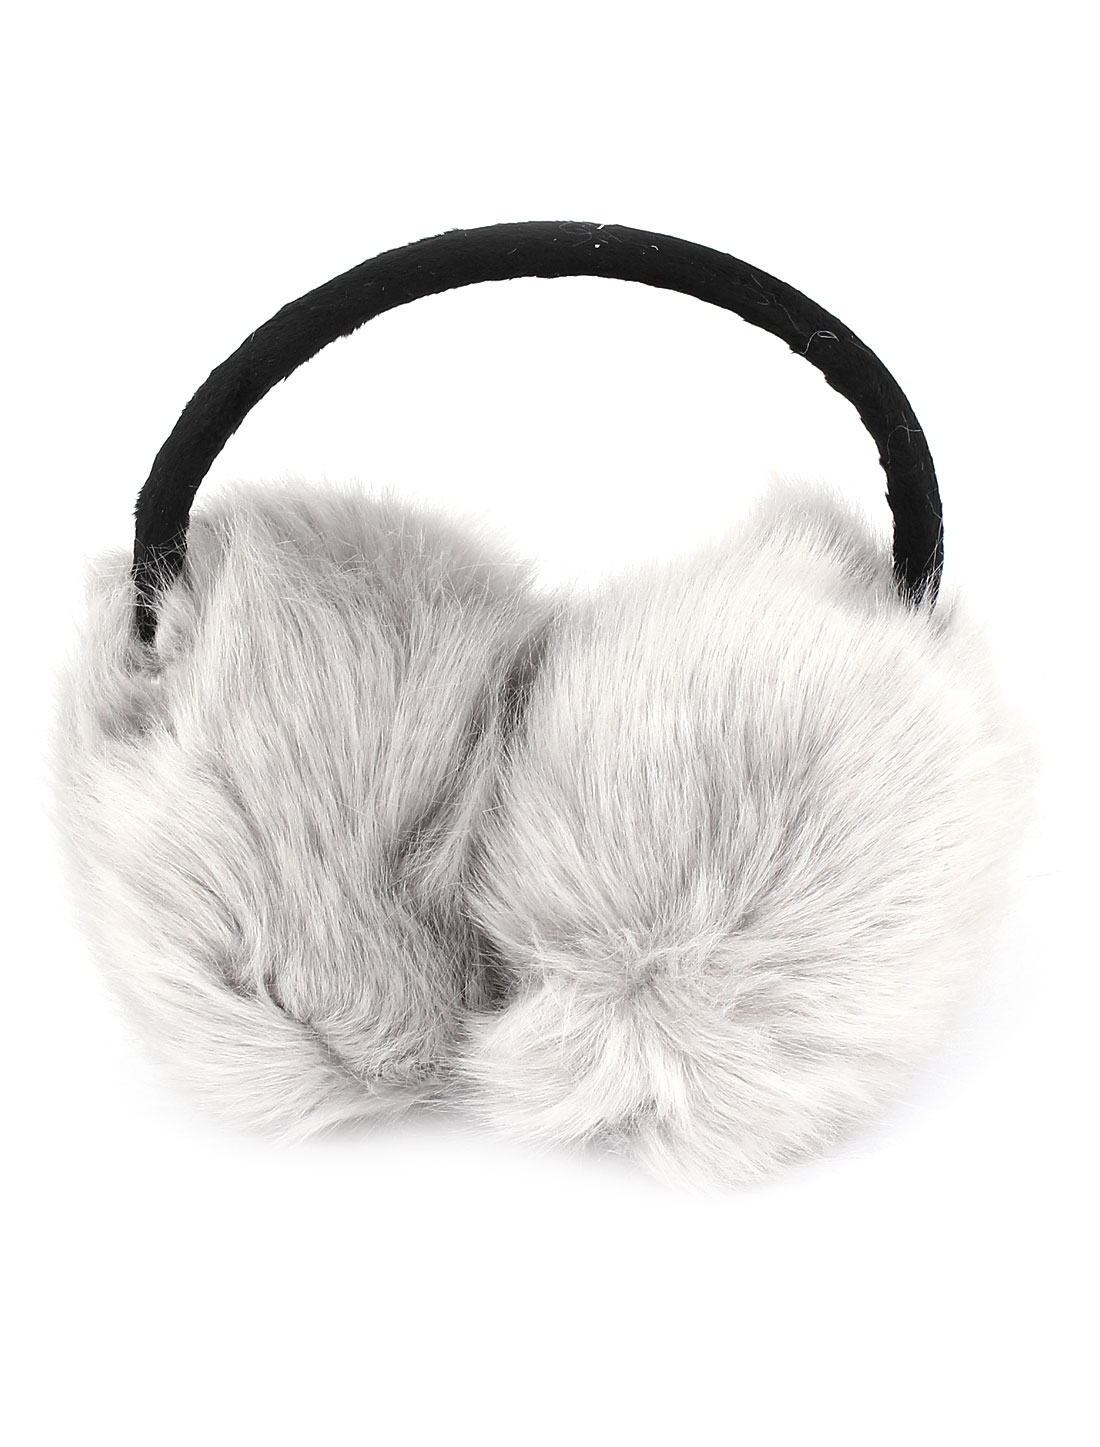 Light Gray Pad Winter Earwarmers Ear Muffs Earmuffs for Women Girls